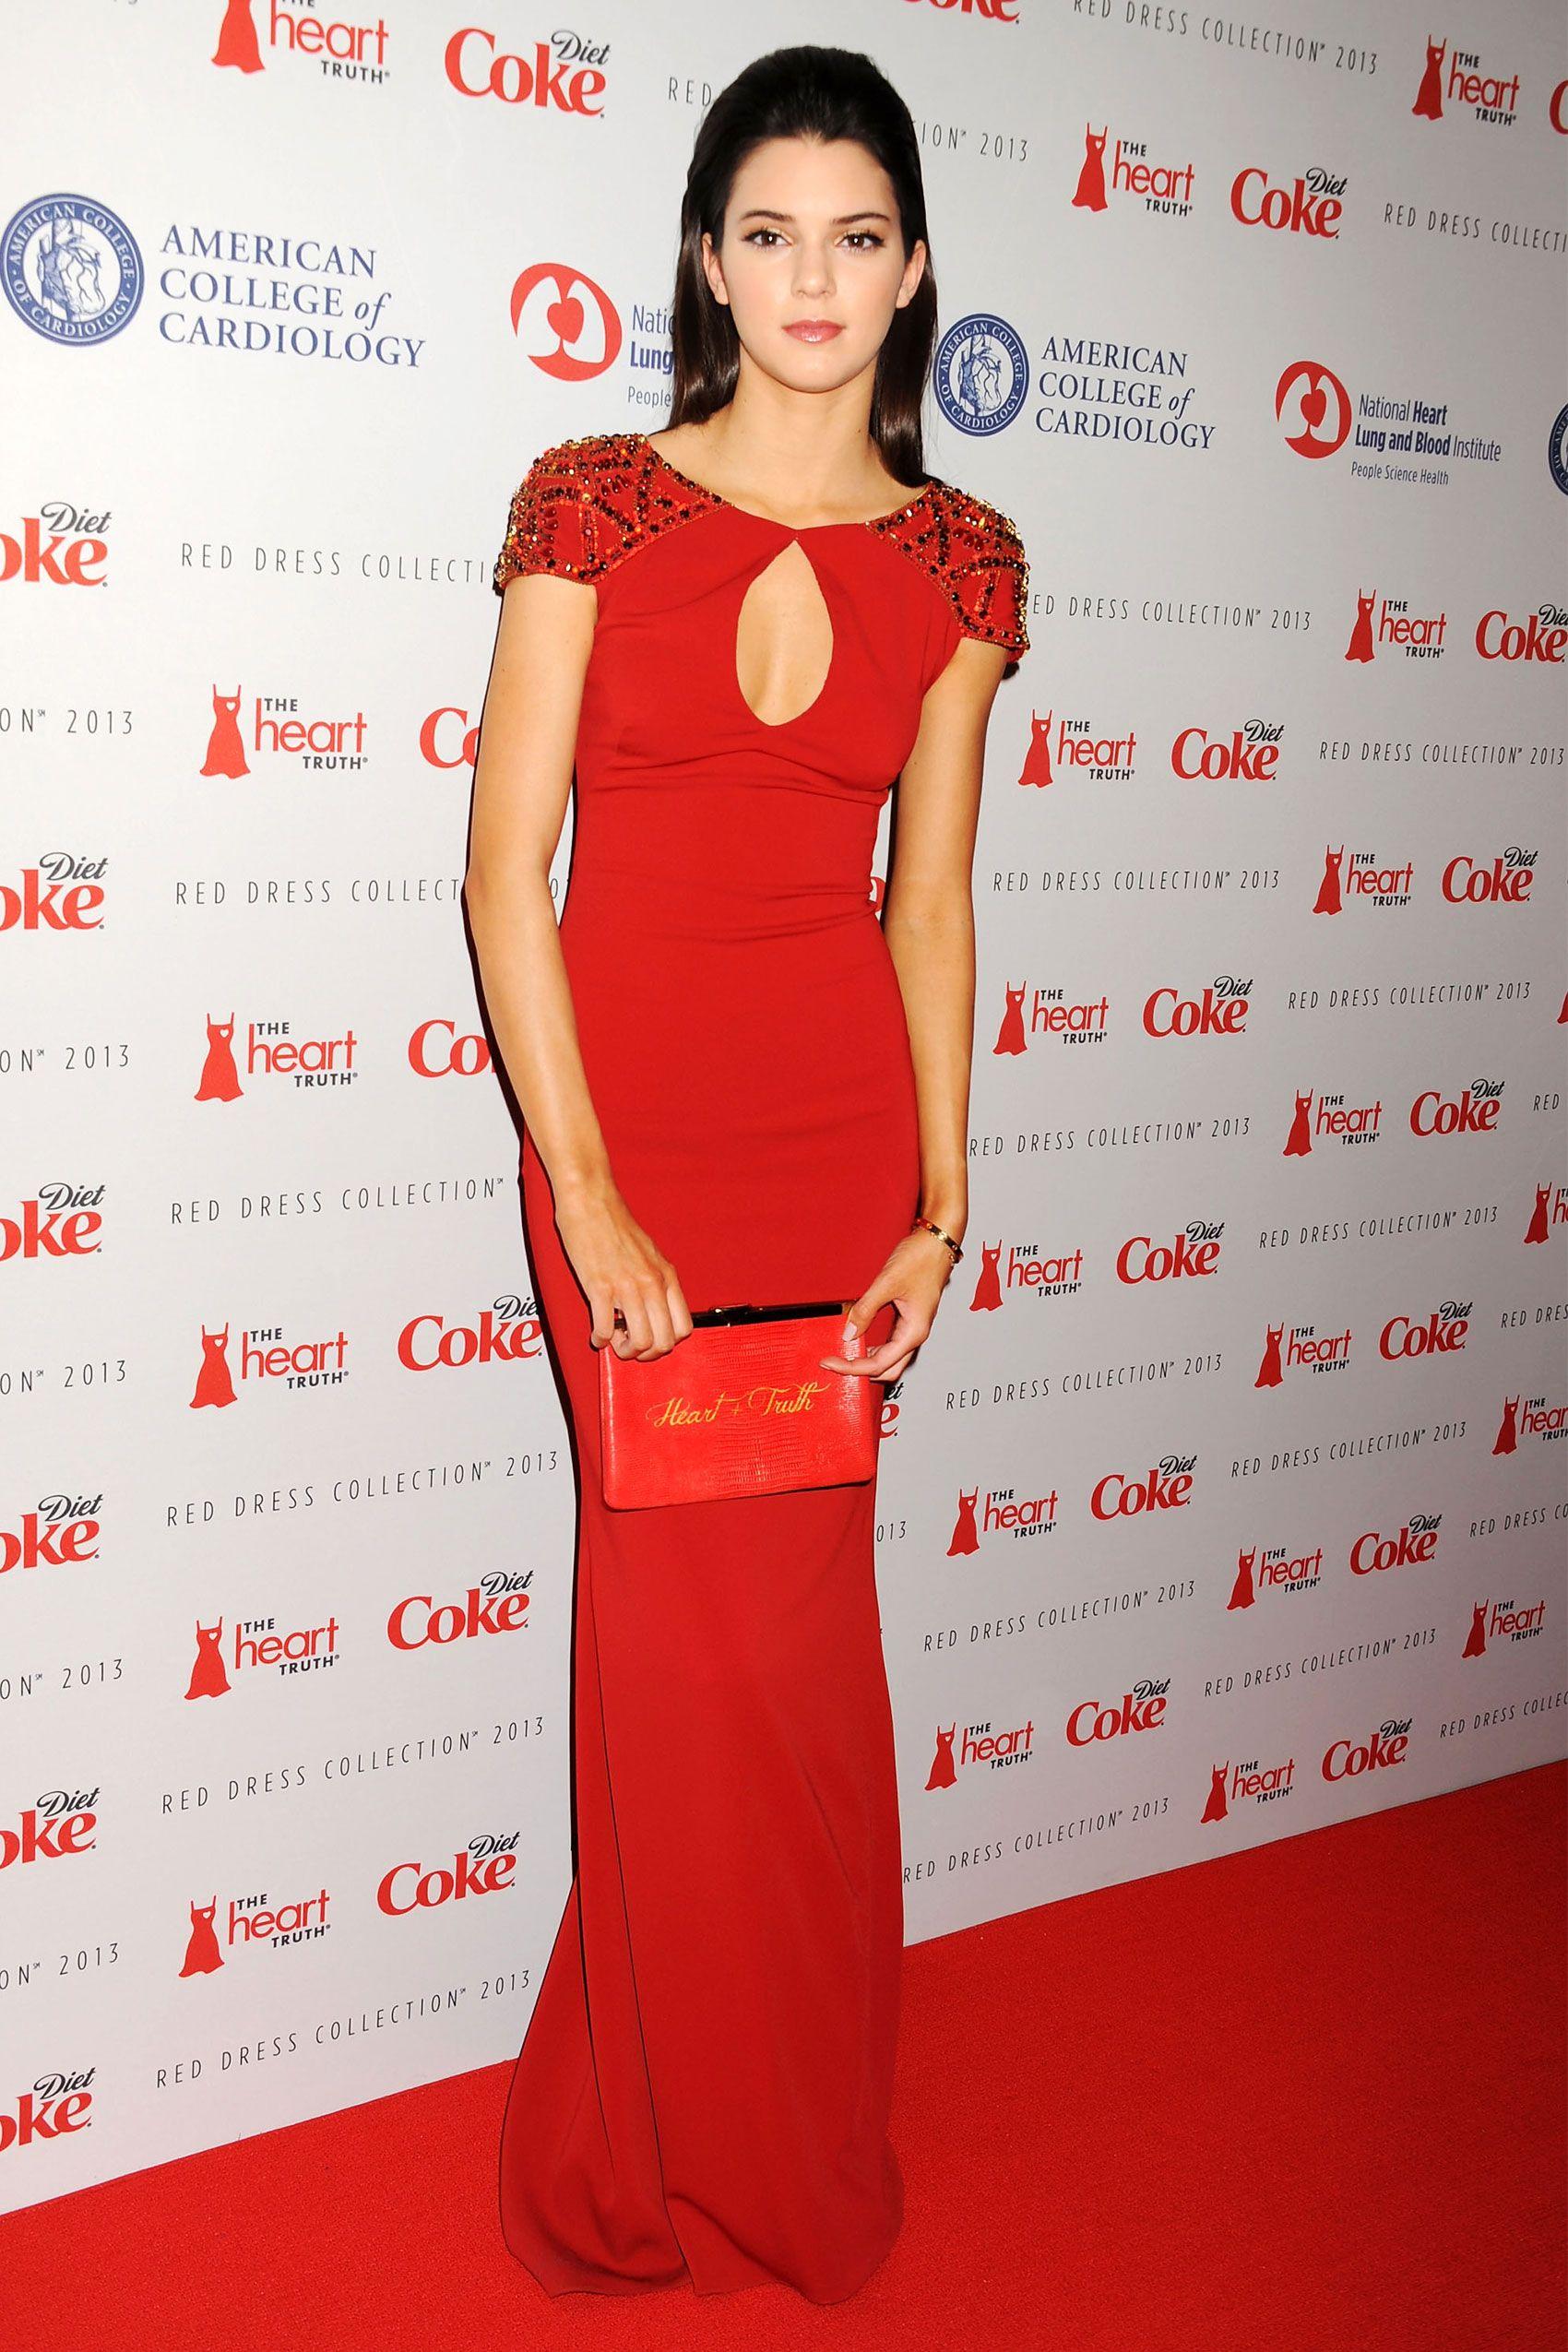 Kendall Jenner Red Carpet Style - Kim Kardashian's Sister Kendall ...